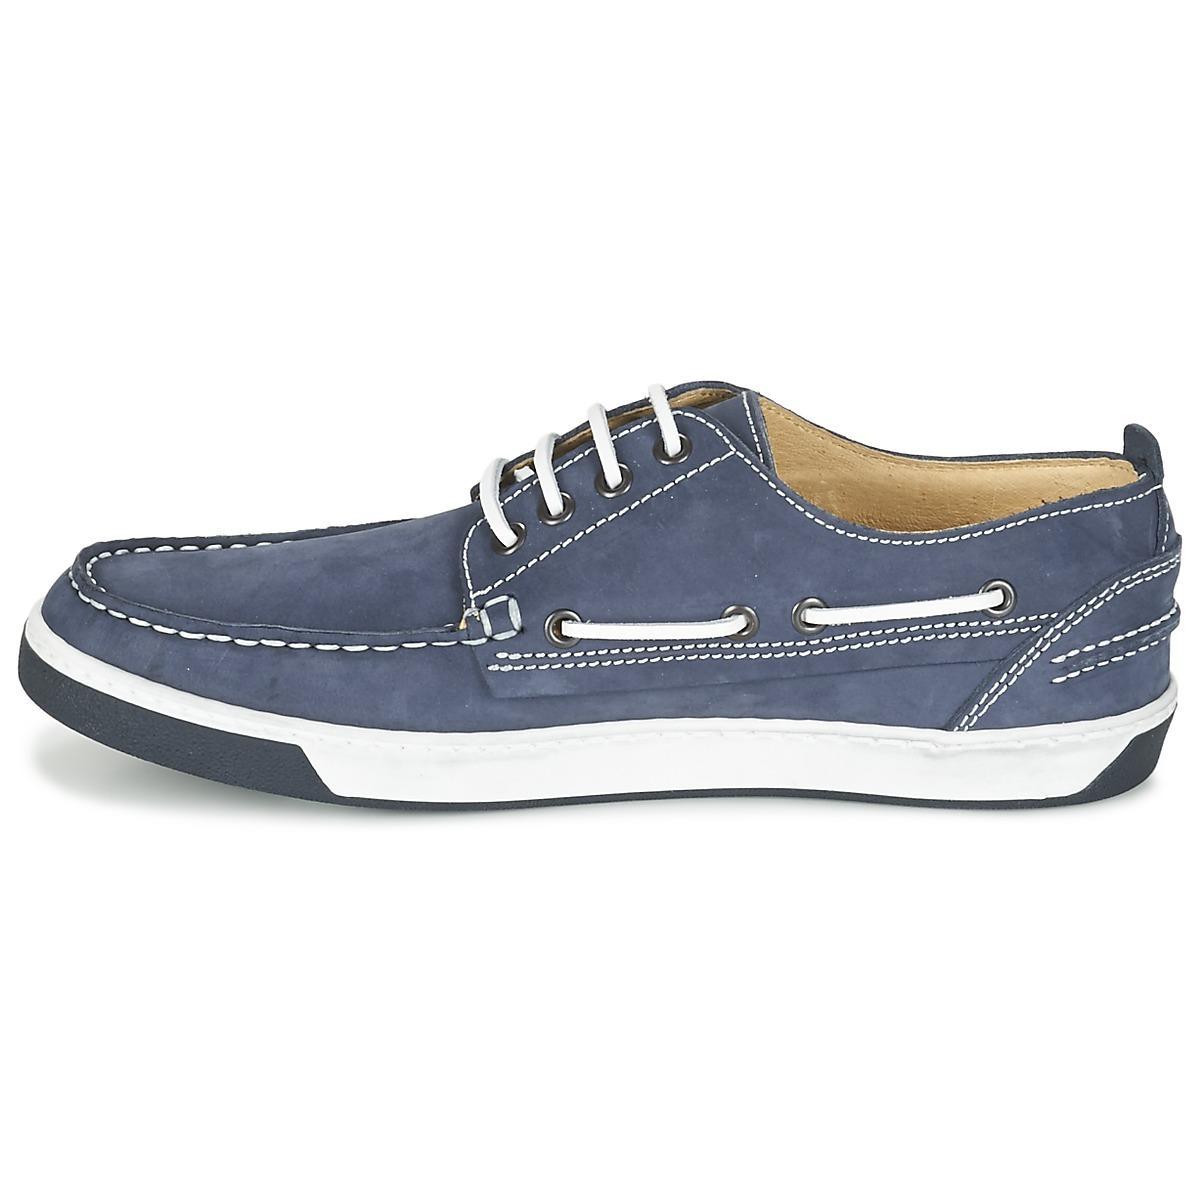 Casual Attitude Geroso Boat Shoes in Blue for Men